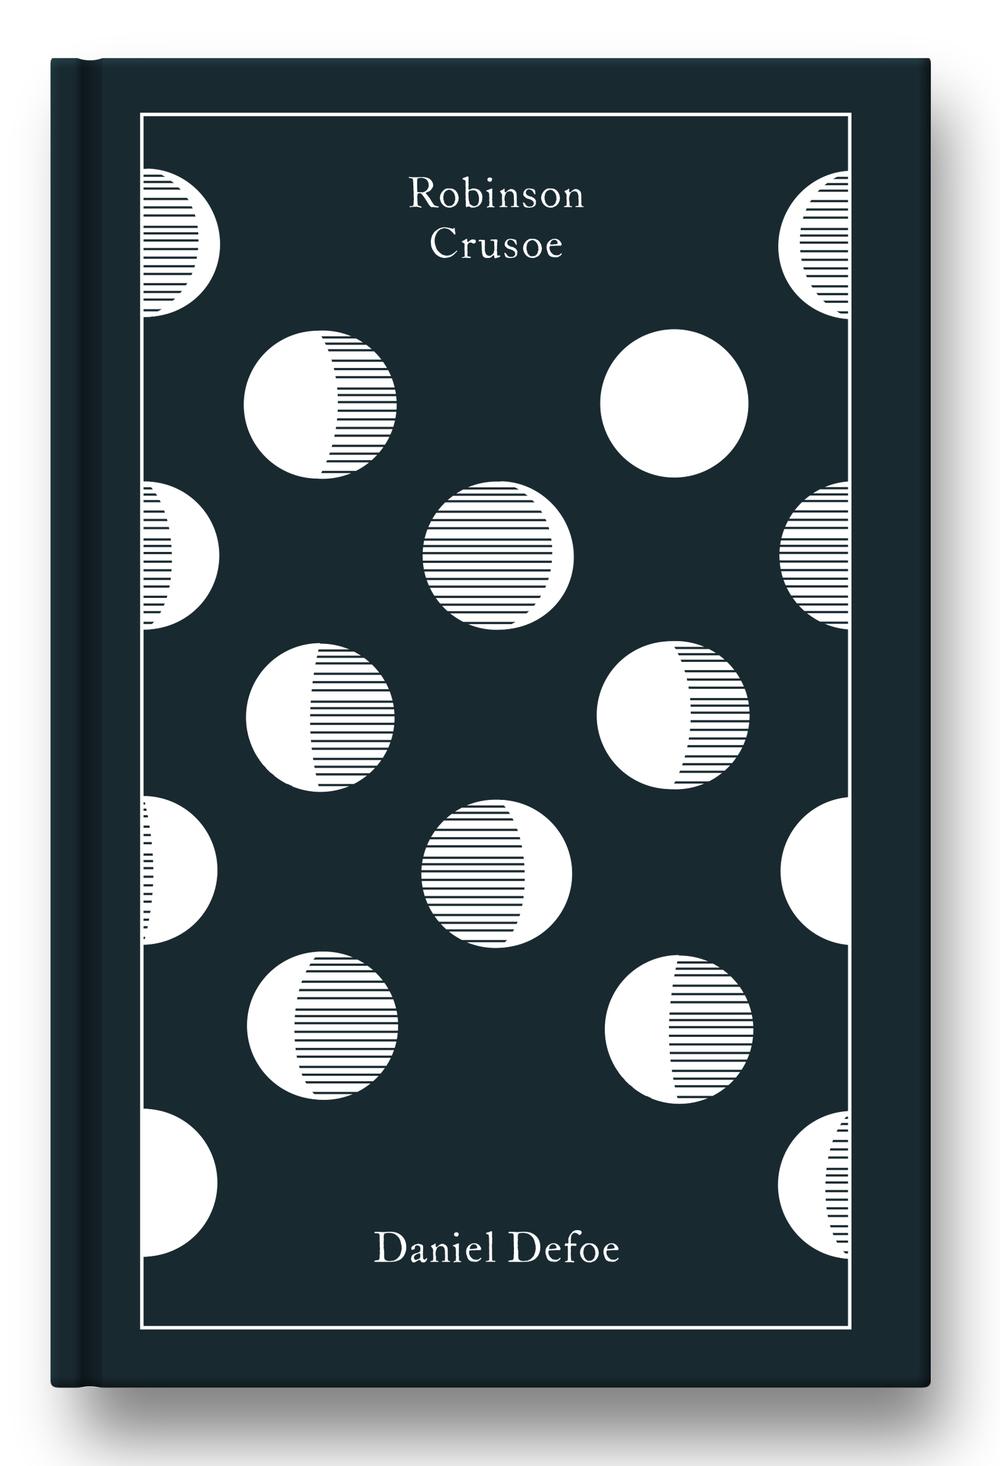 RobinsonCrusoe.jpg